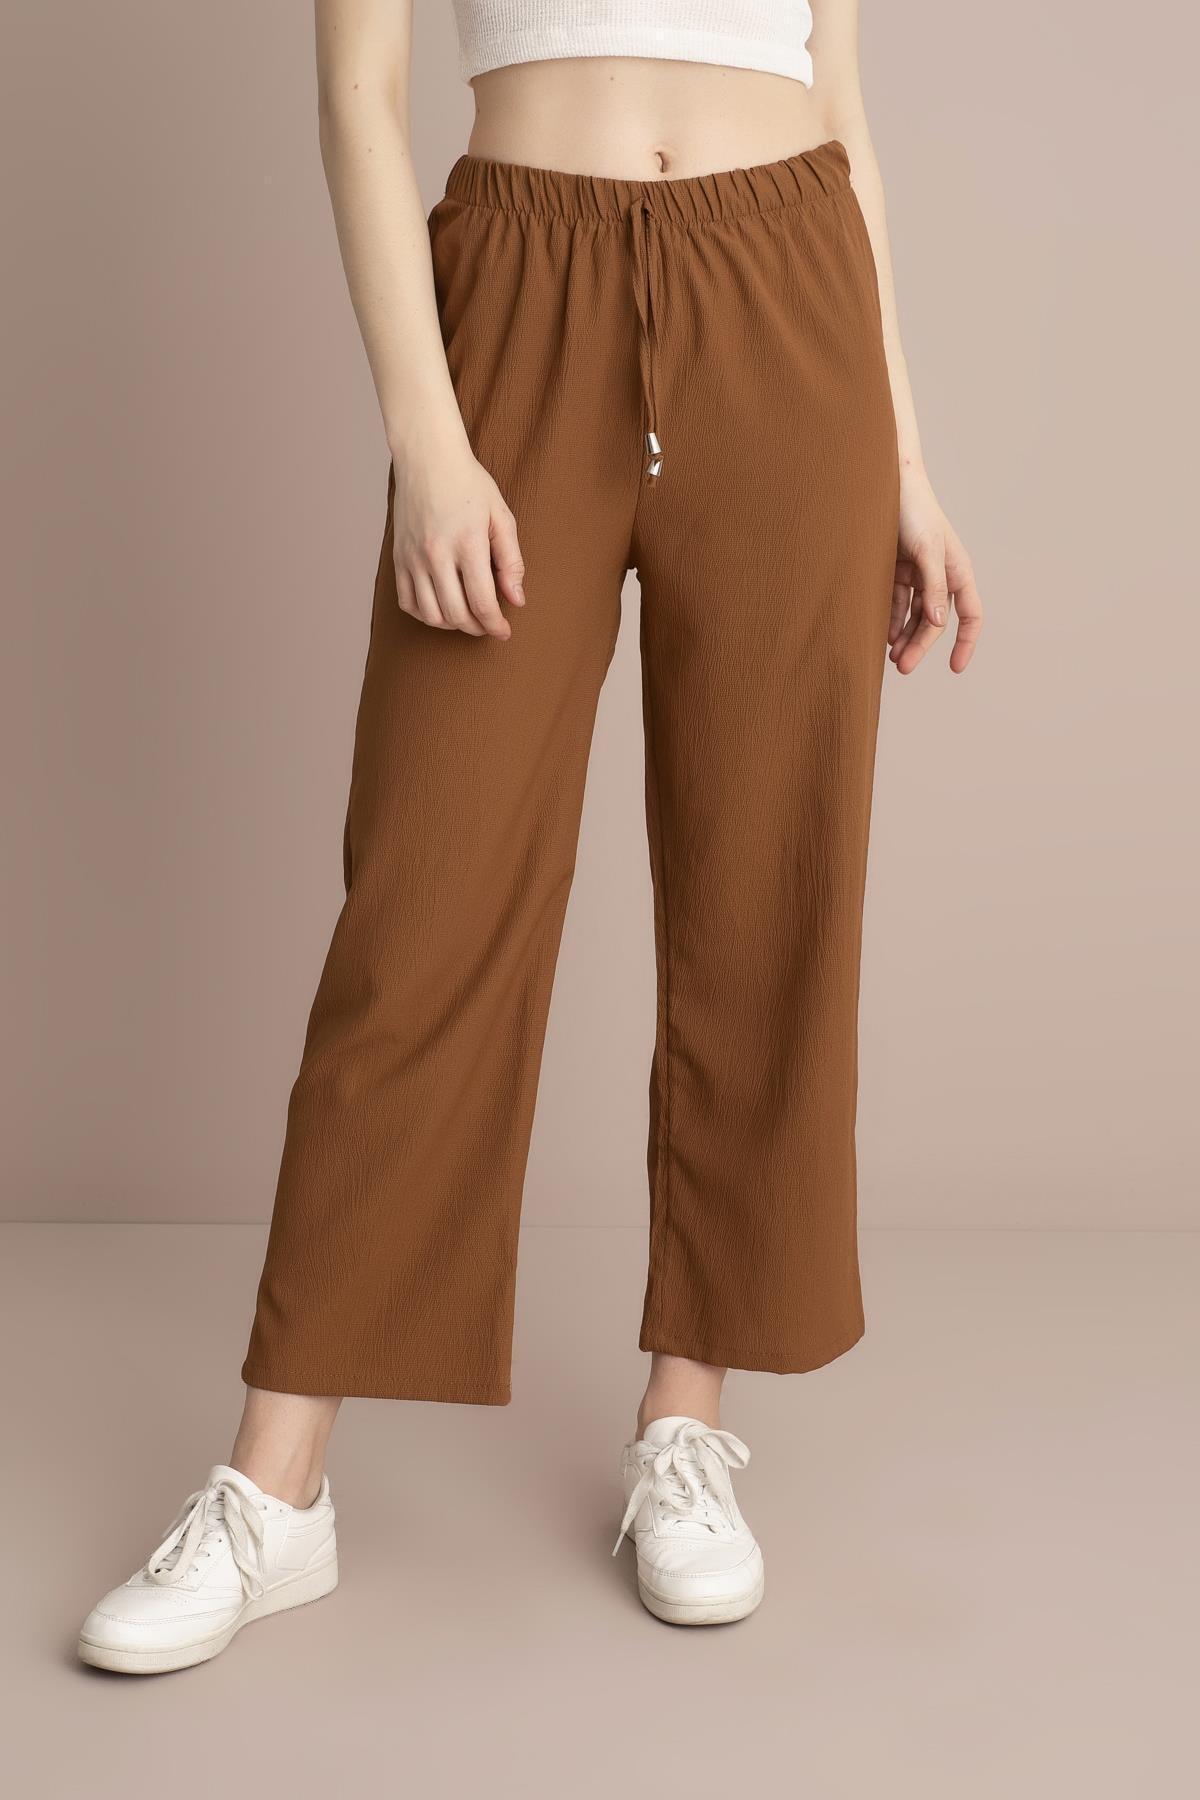 TENA MODA Kadın Tarçın Bel Lastikli Bol Paça Pantolon 1